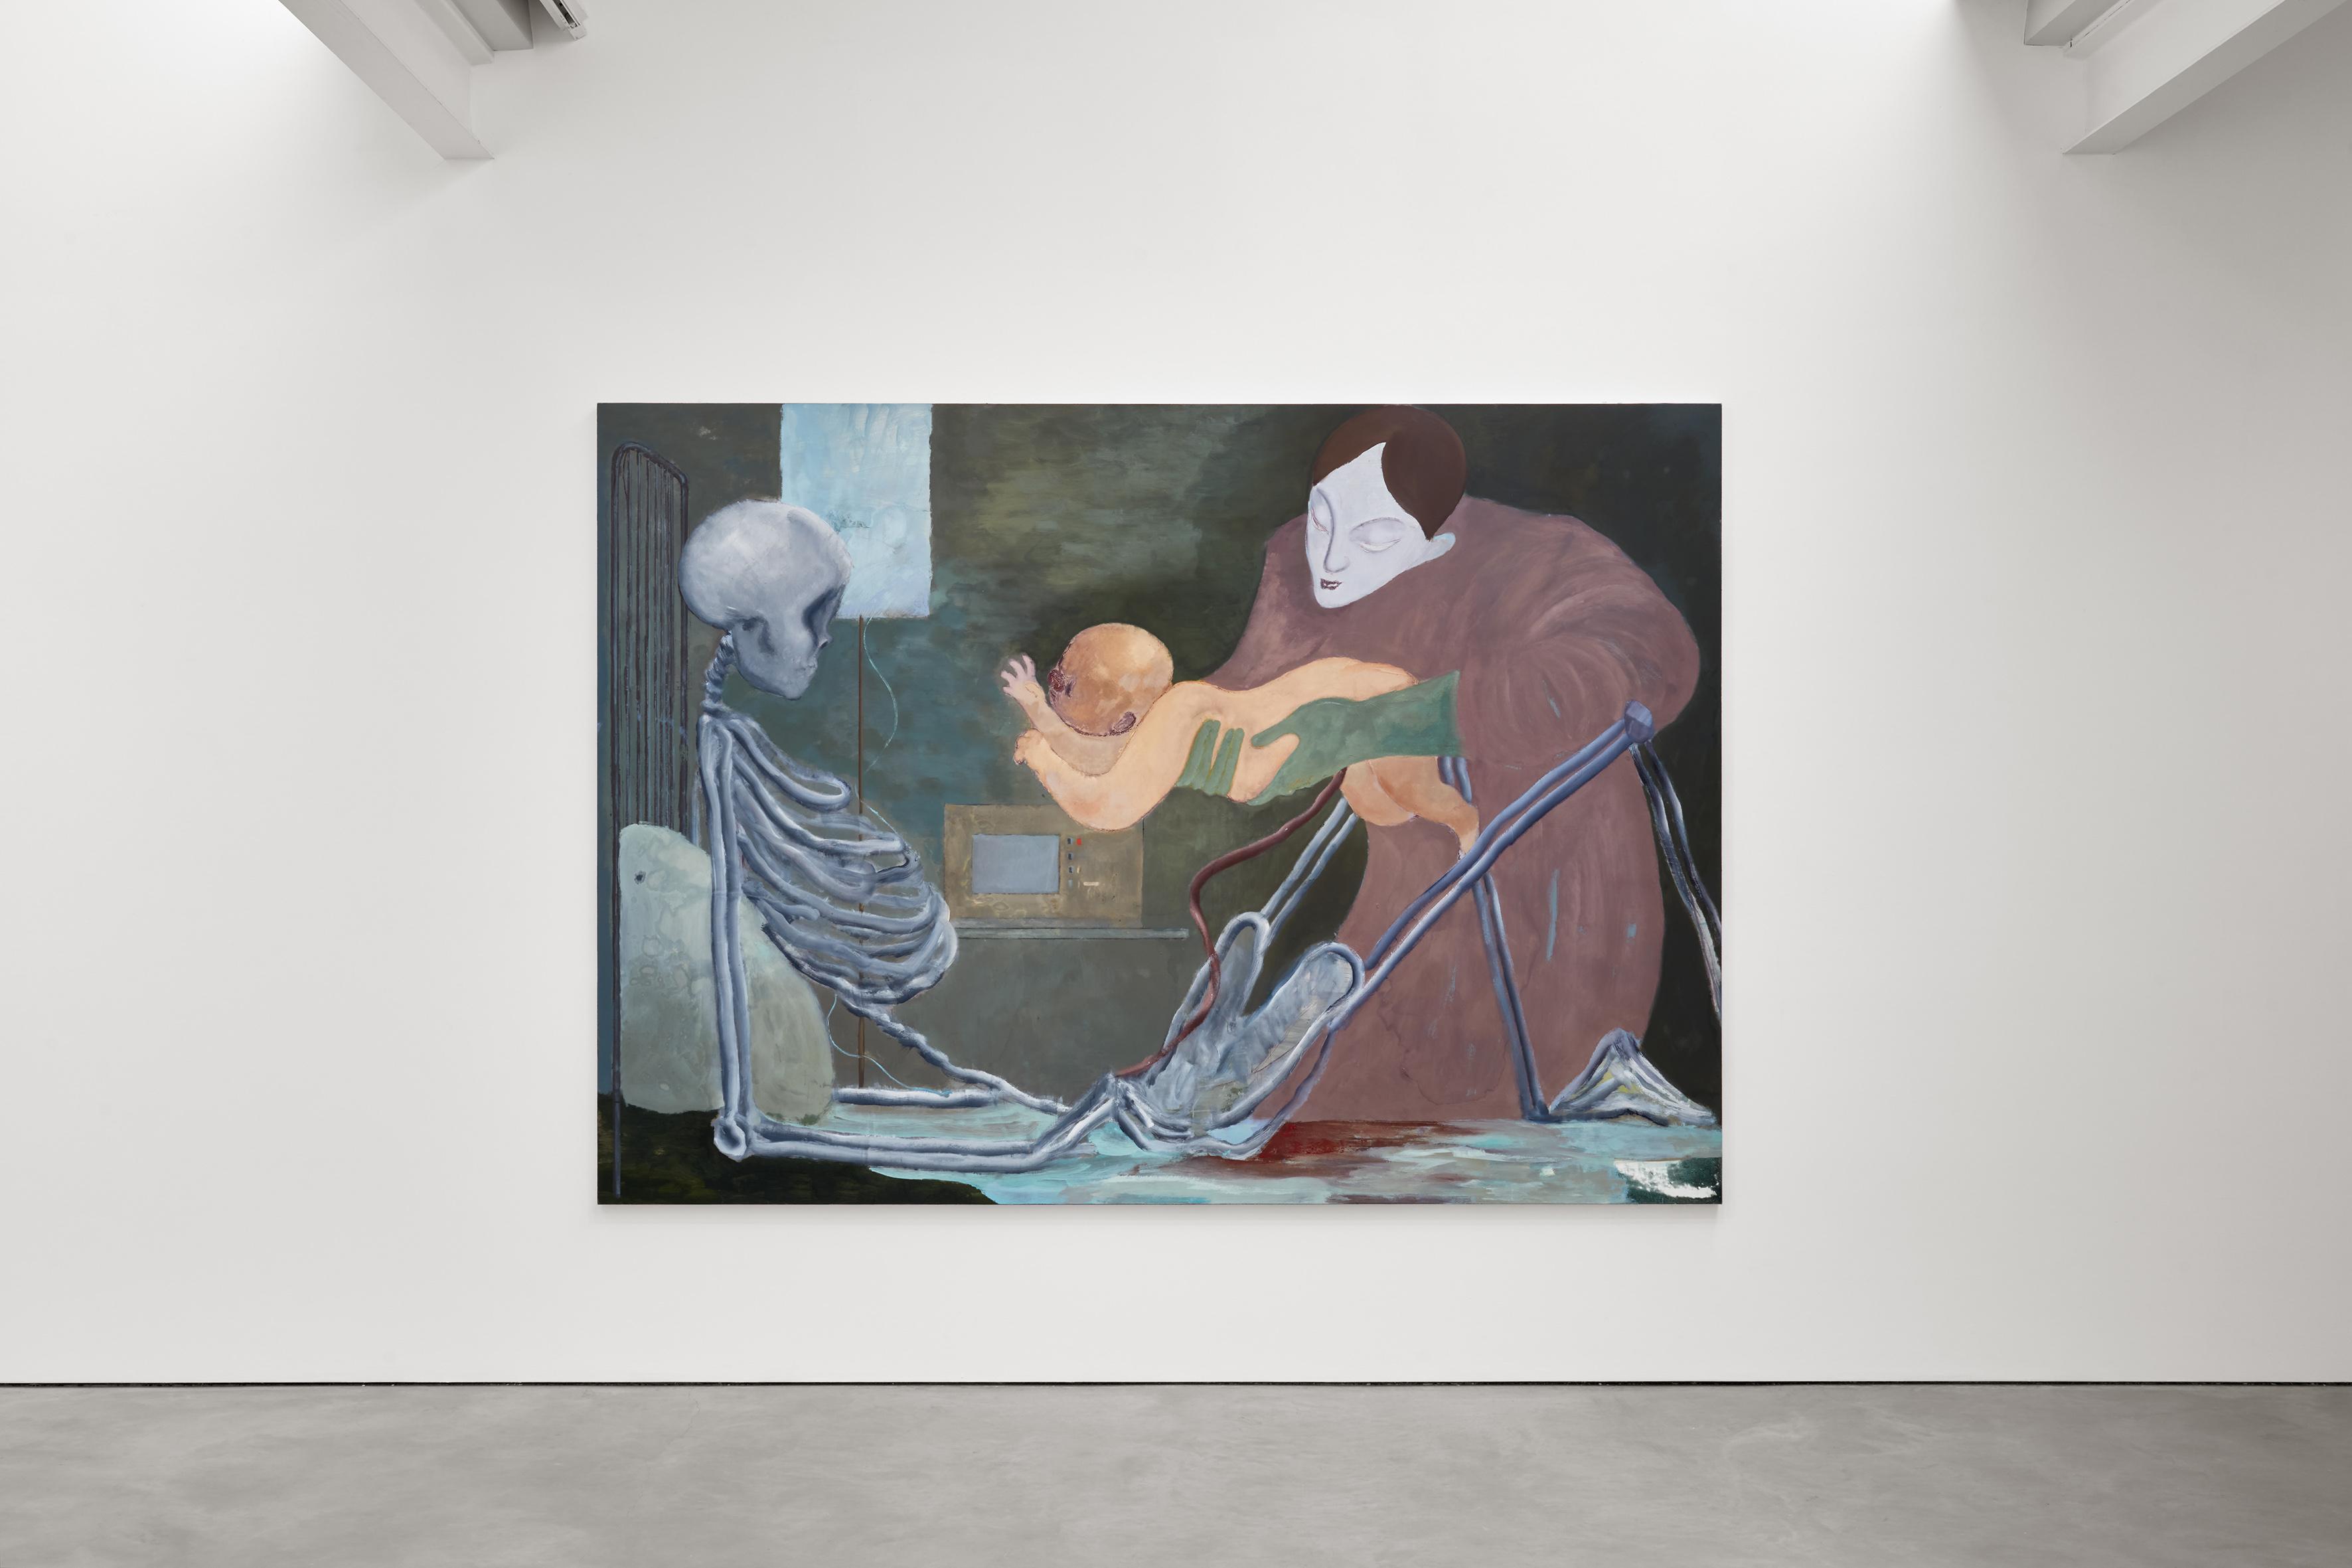 Sanya Kantarovsky, The House of the Spider, Modern Art Helmet Row, London, exhibition view, 8 May - 12 June 2021. Photo: Robert Glowacki. Courtesy: the artist and Modern Art, London